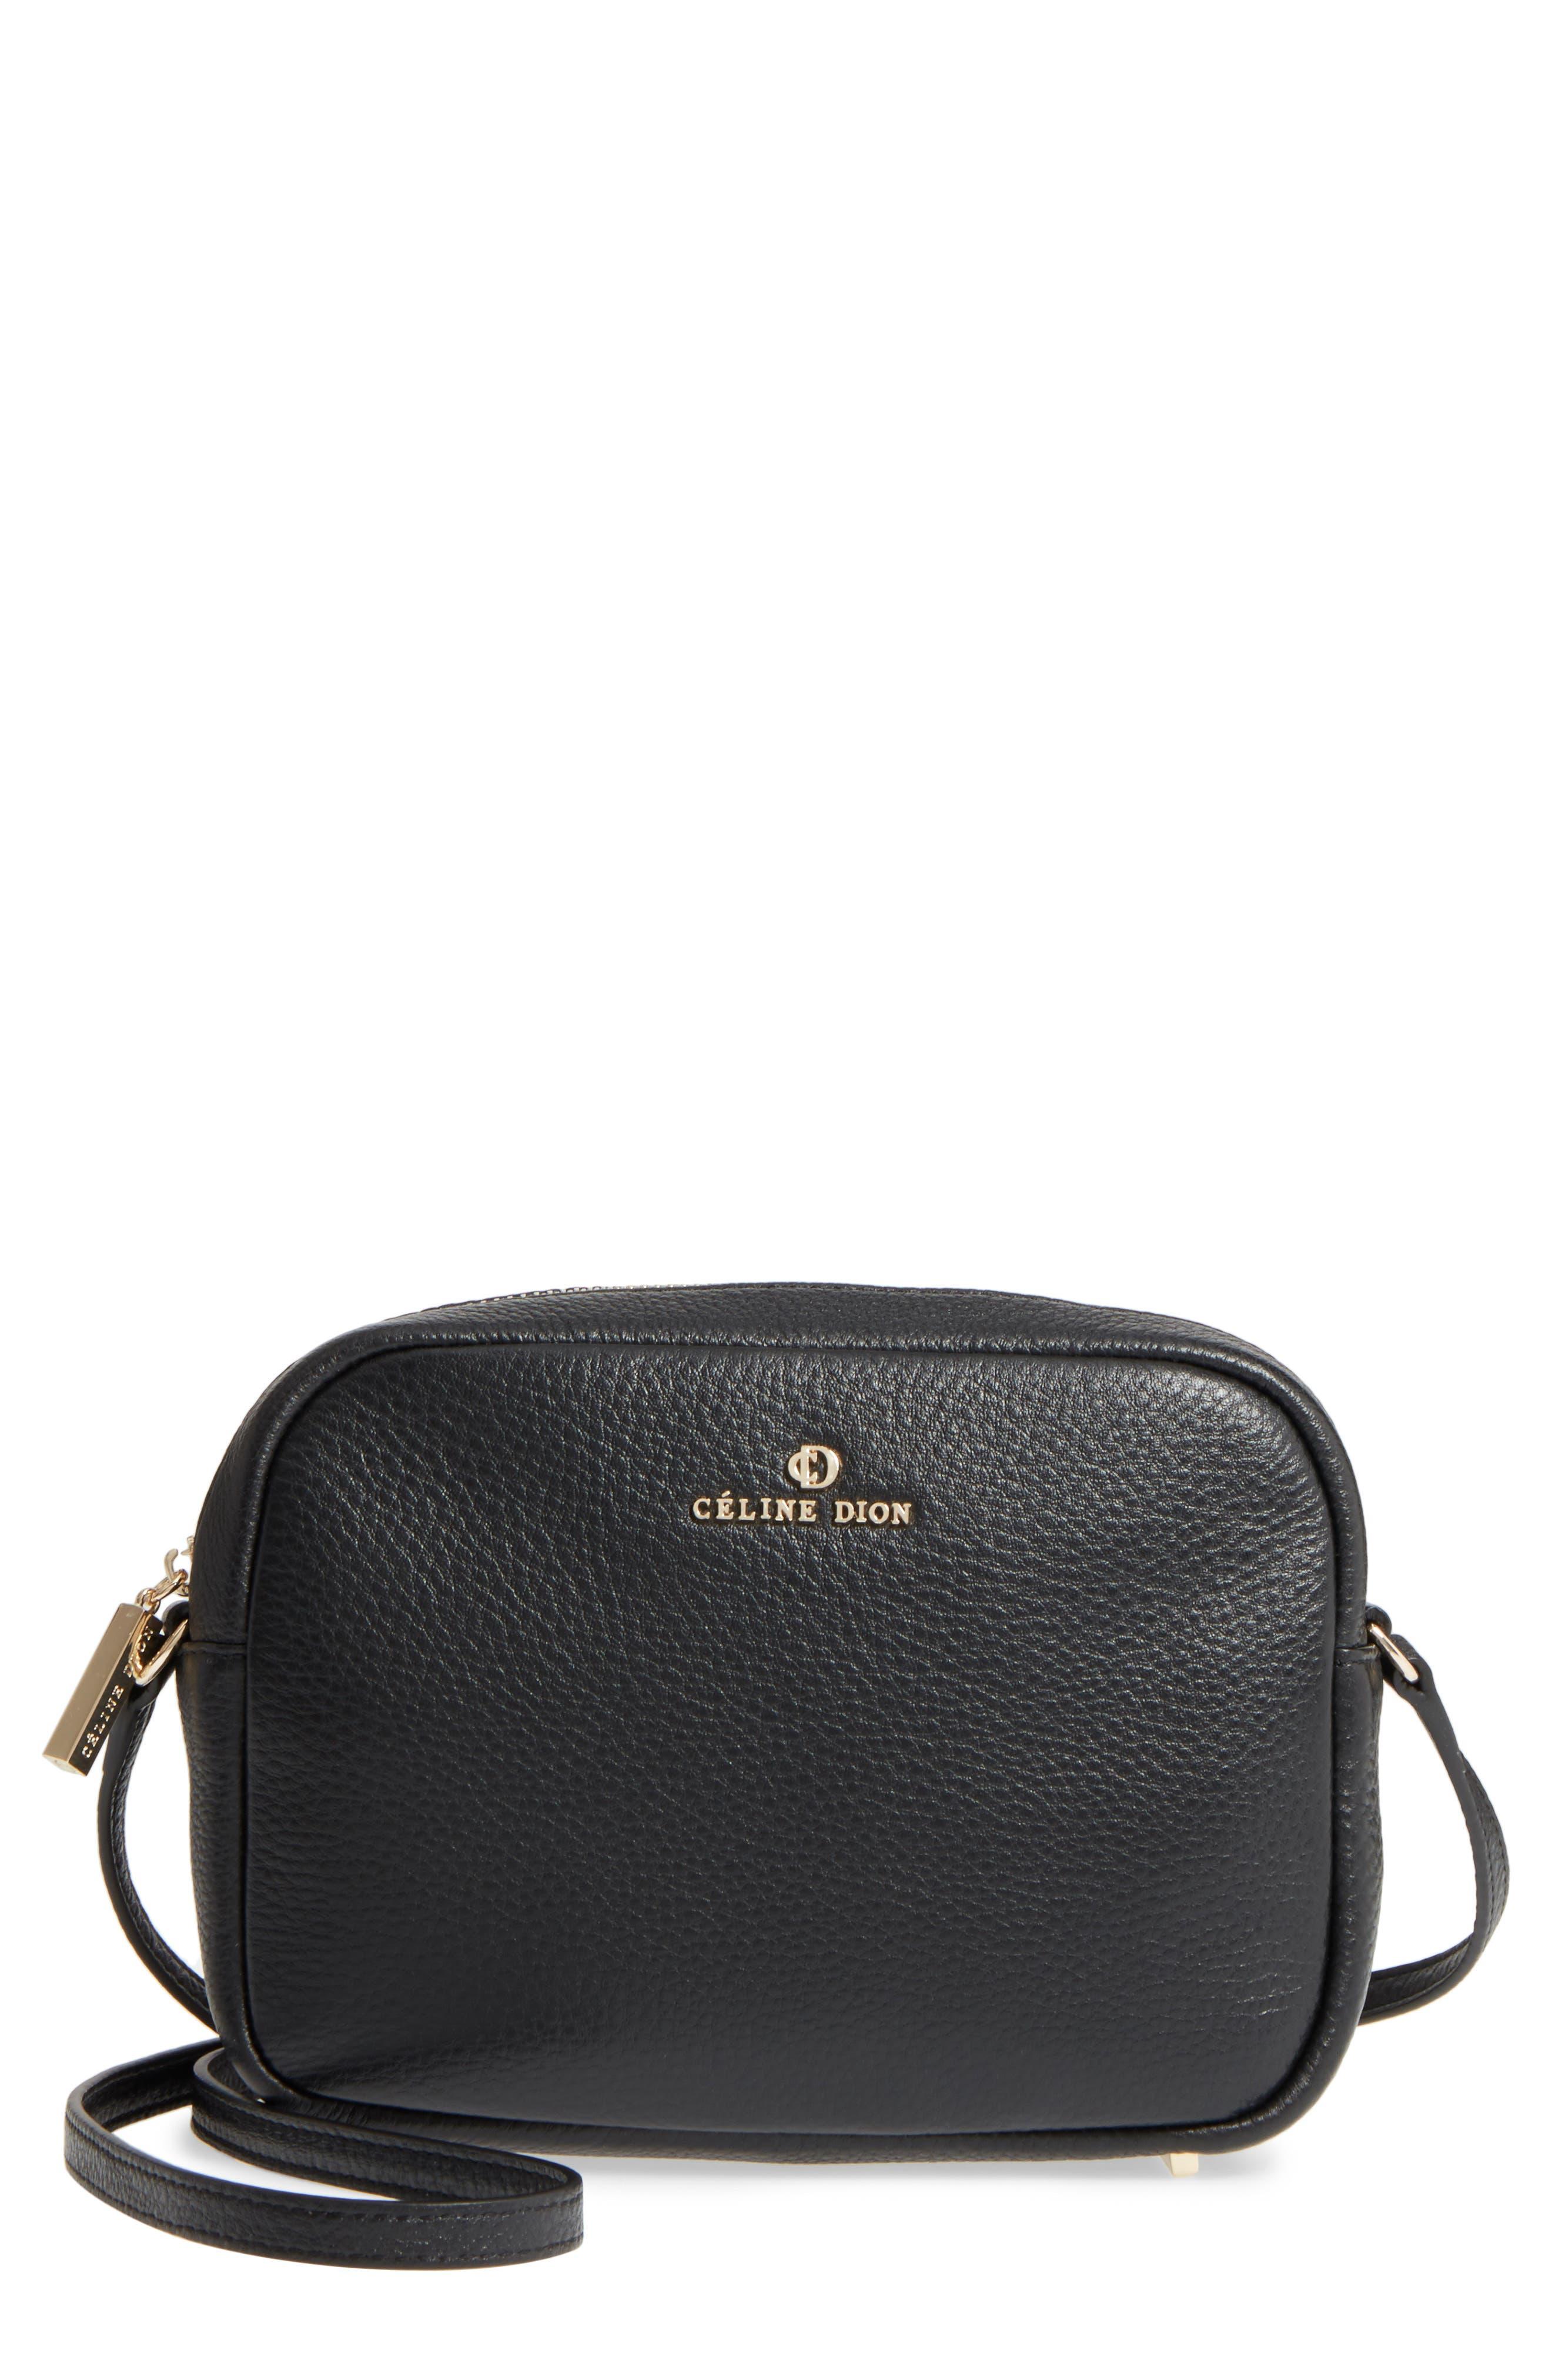 Céline Dion Adagio Leather Camera Crossbody Bag,                         Main,                         color,